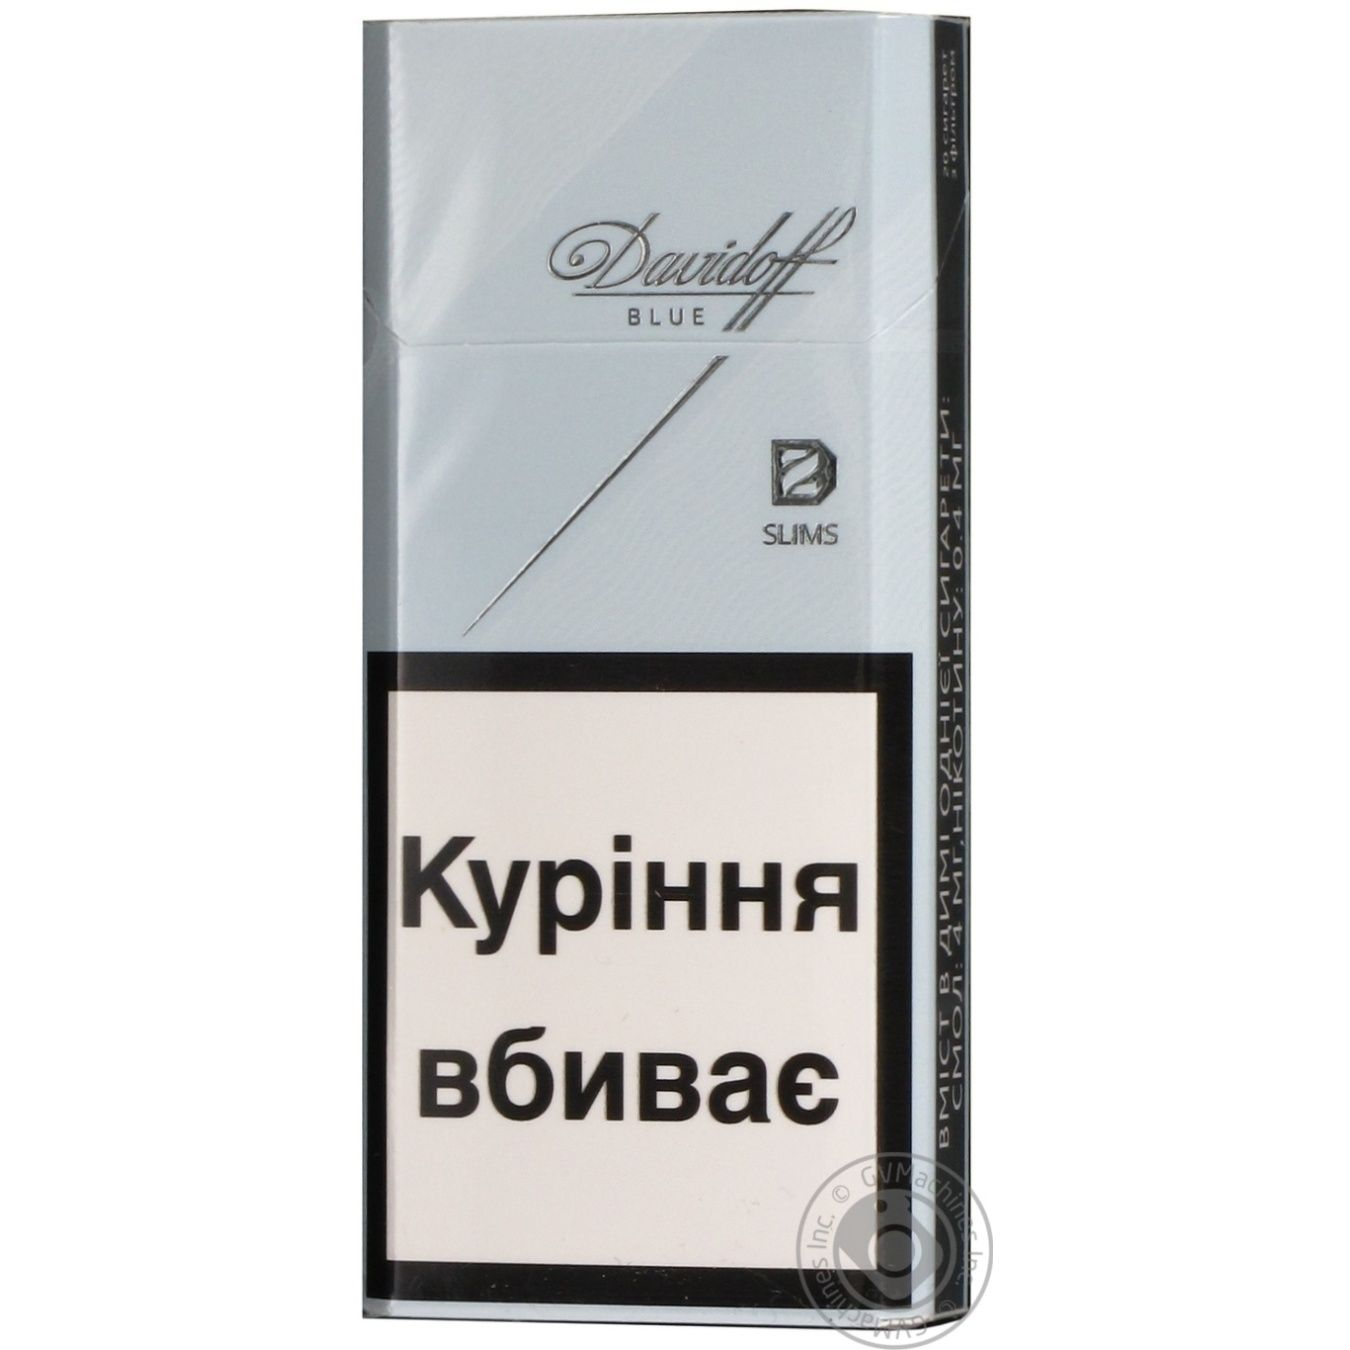 Cigarettes Davidoff Slims blue 25g → Tobacco goods